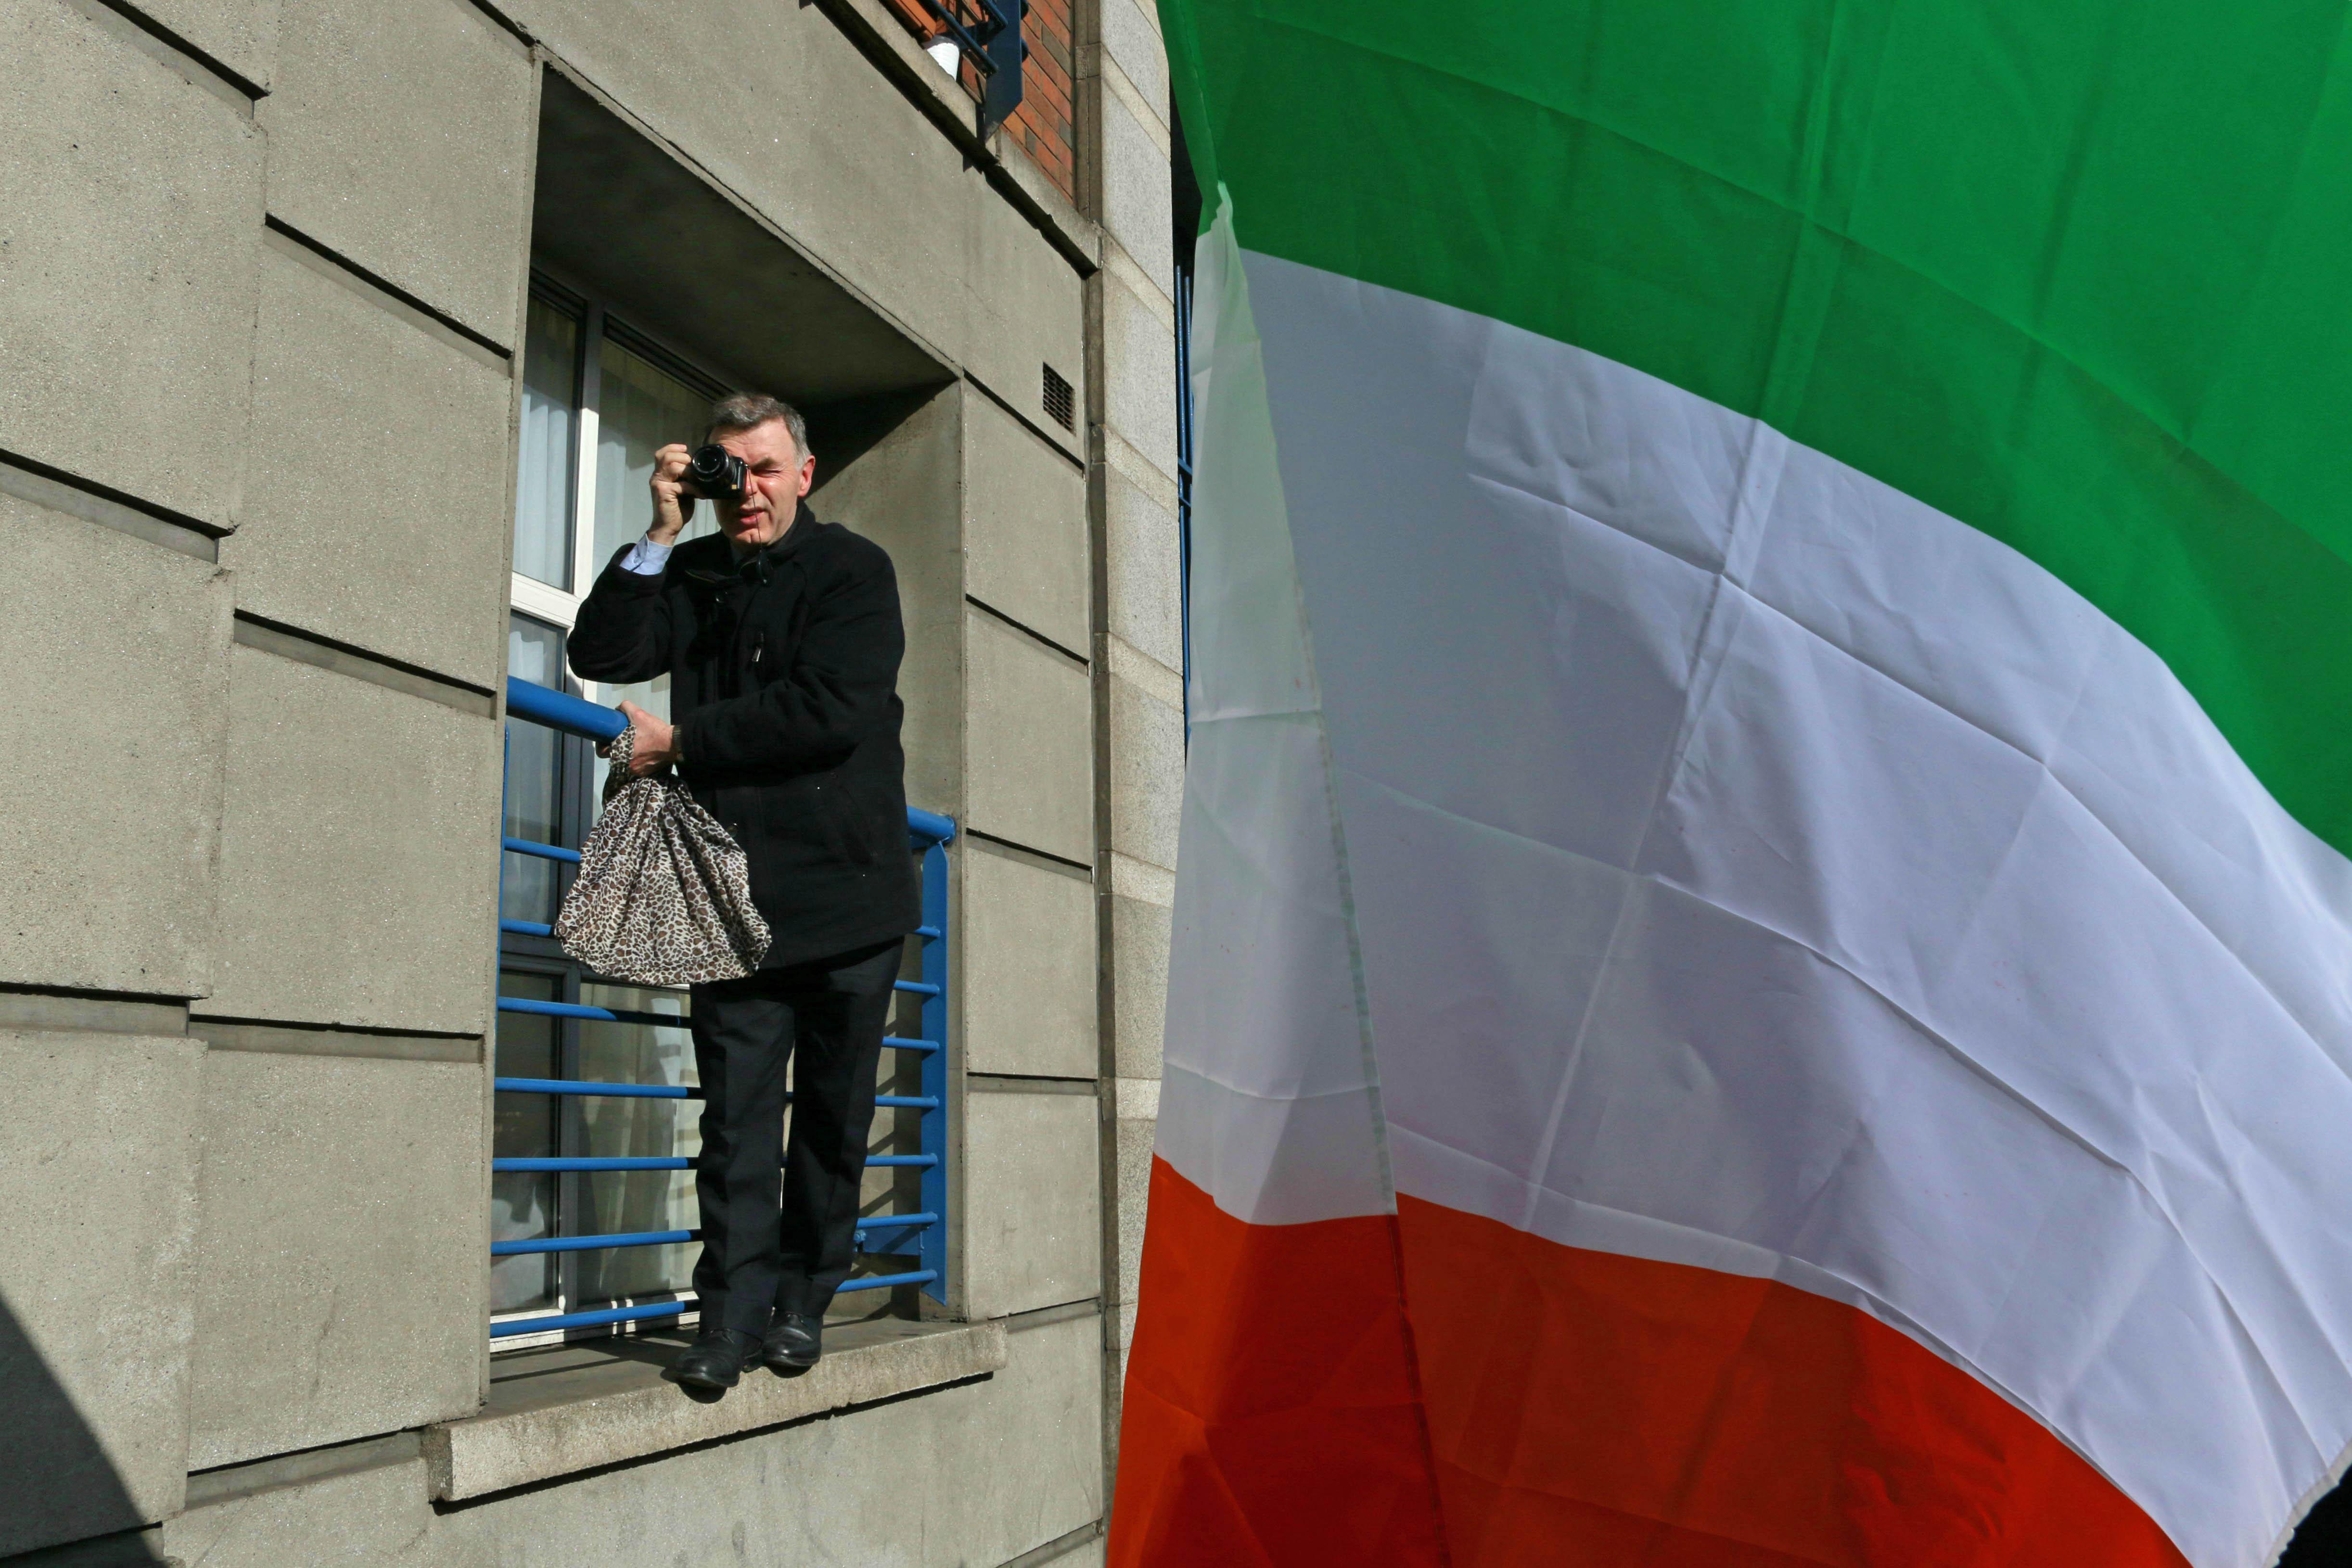 Dublin, 2016 (Danielle Houghton/GroundTruth)